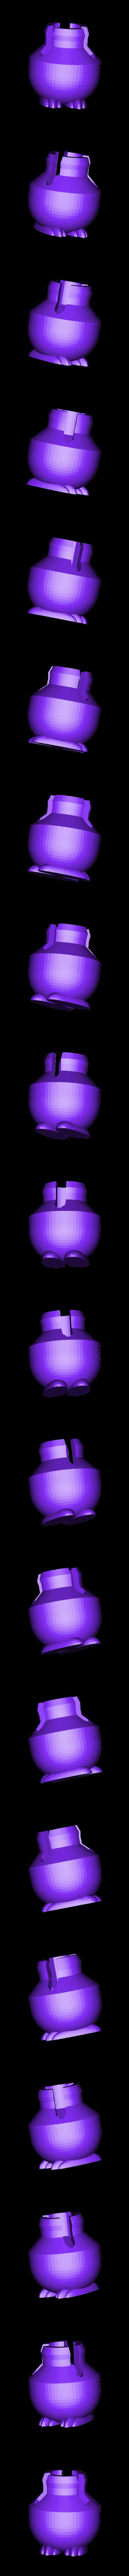 mtmk_trifix_batbottom.stl Download free STL file 3D Monstamaka • 3D printing design, mageli